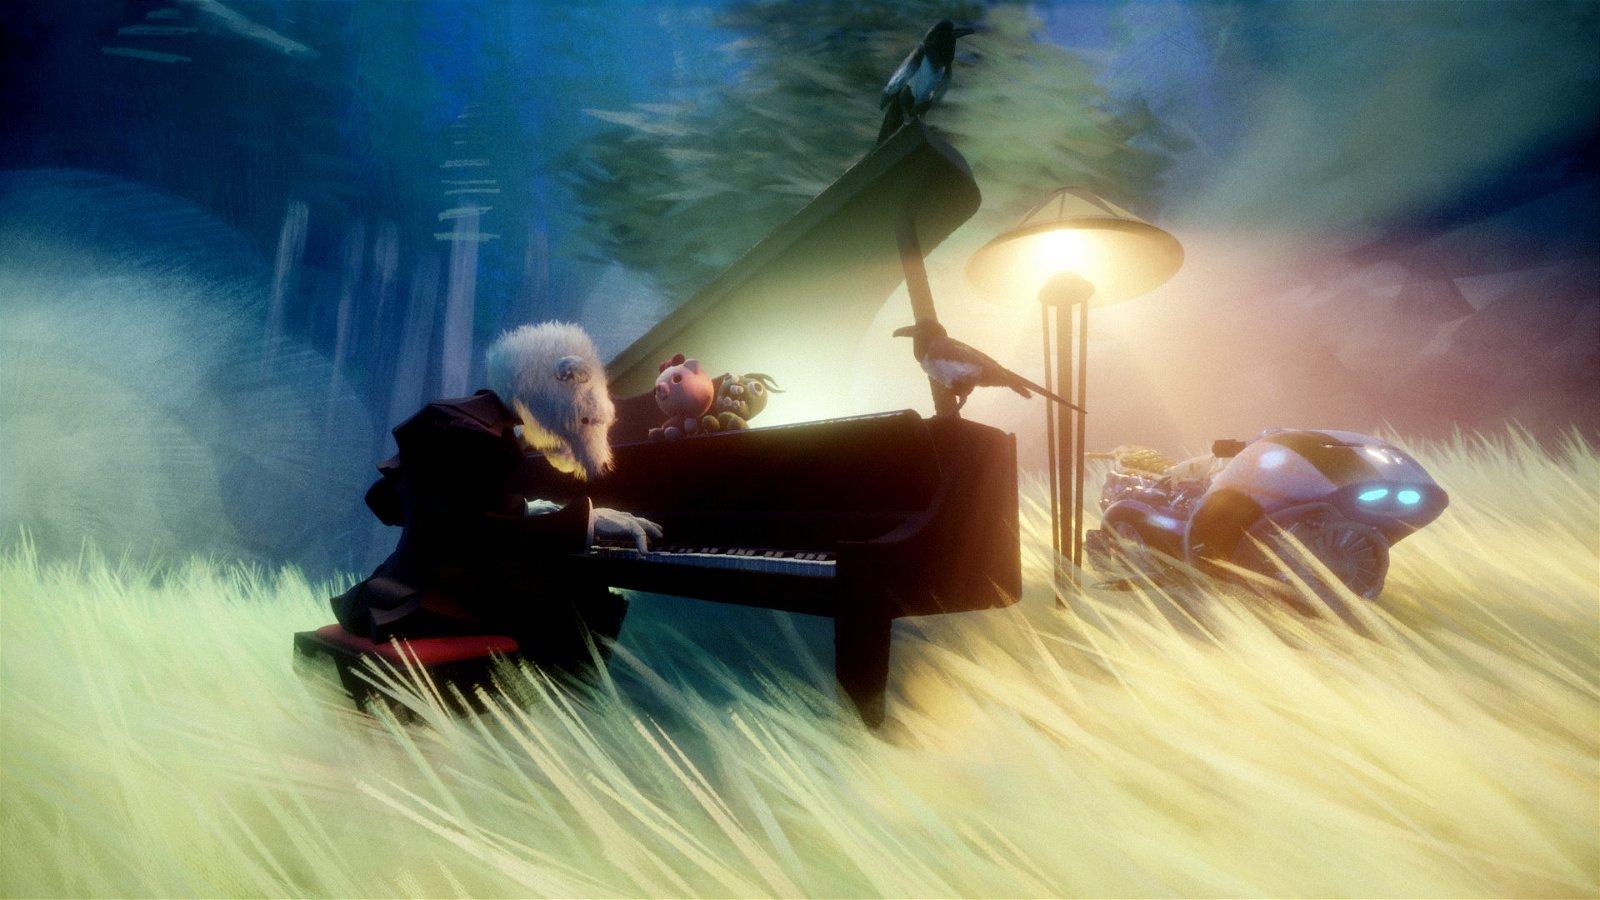 Dreams VR Update Arrives for PS4 2